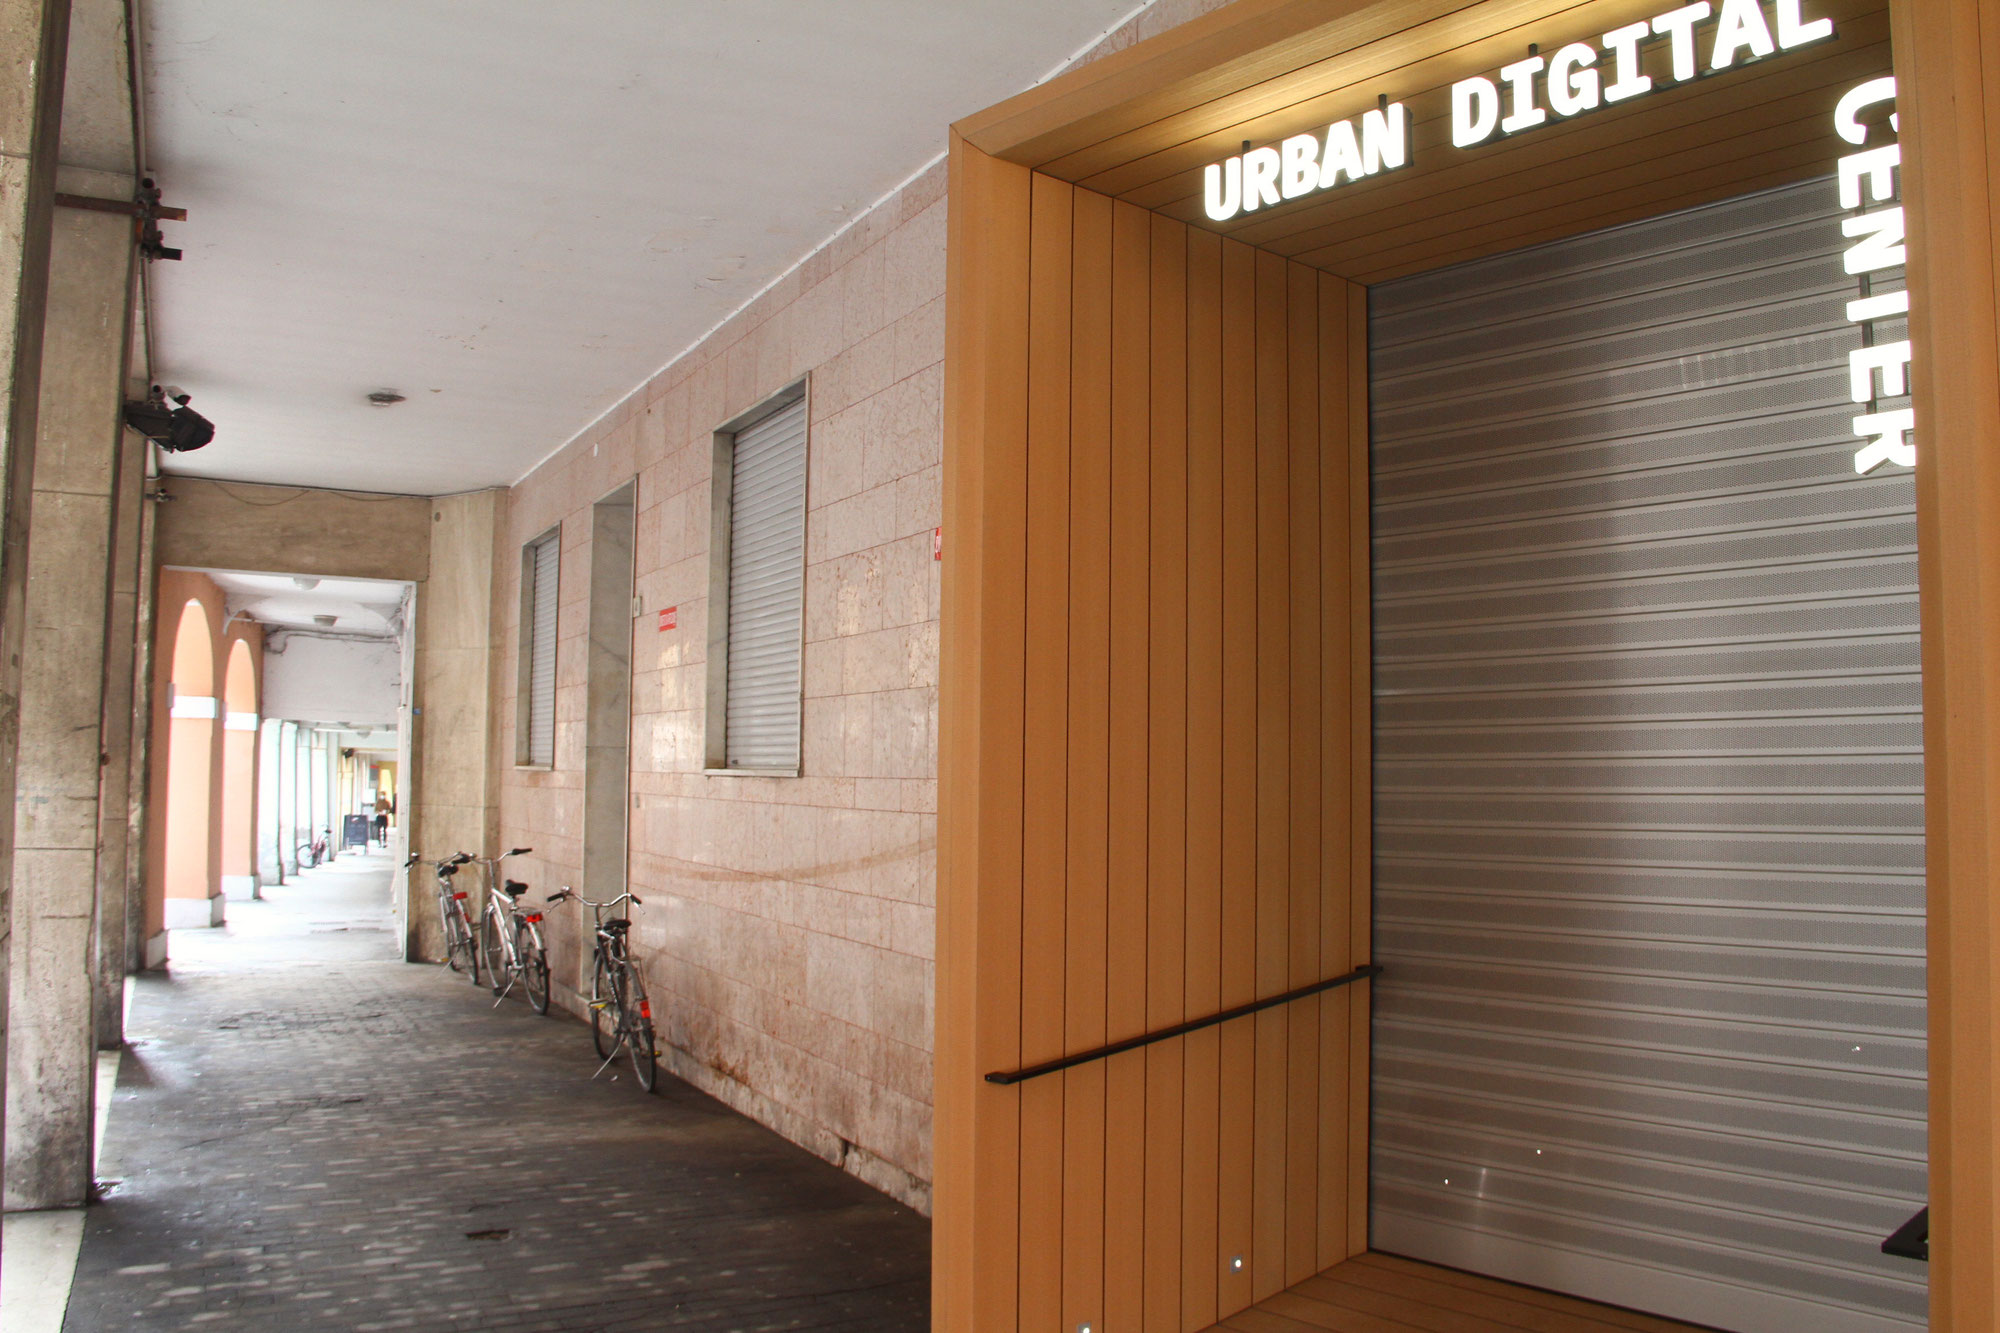 Inaugura Urban Digital Center – InnovationLab di Rovigo